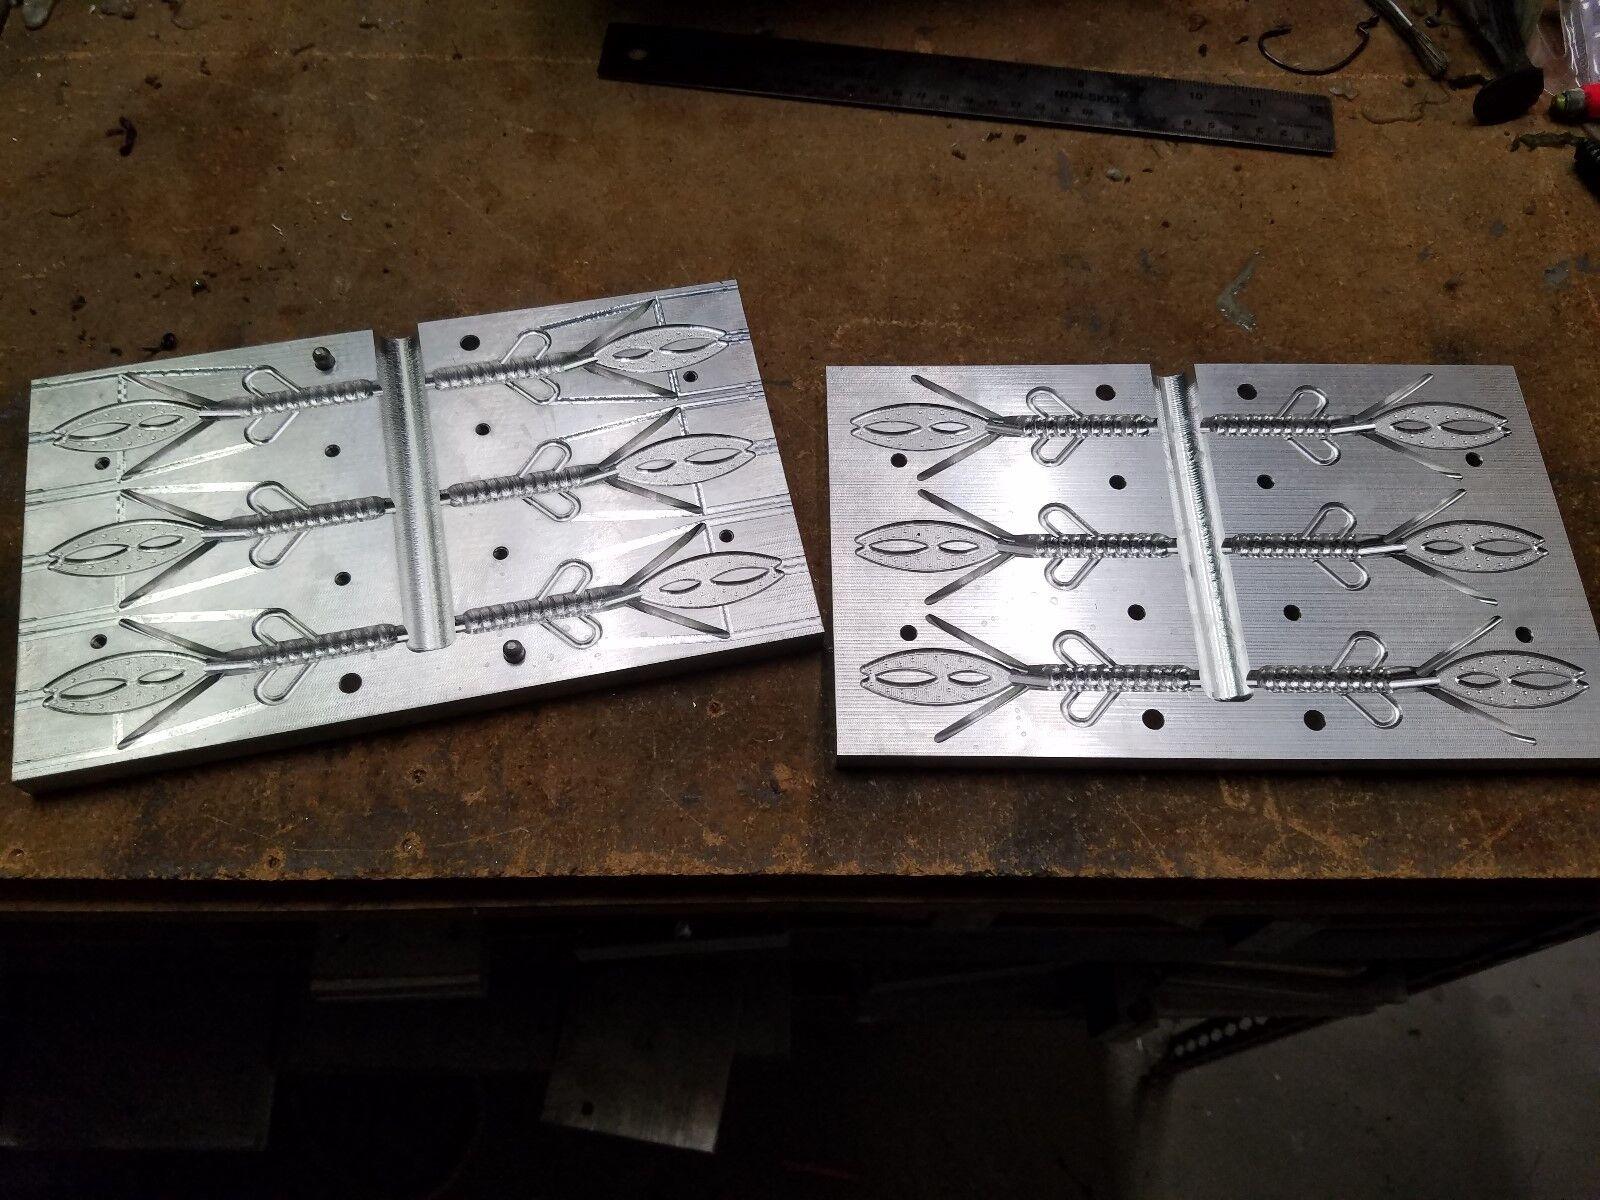 Superior Bump Hog 6 Cavity Made By CNC Molds N Stuff